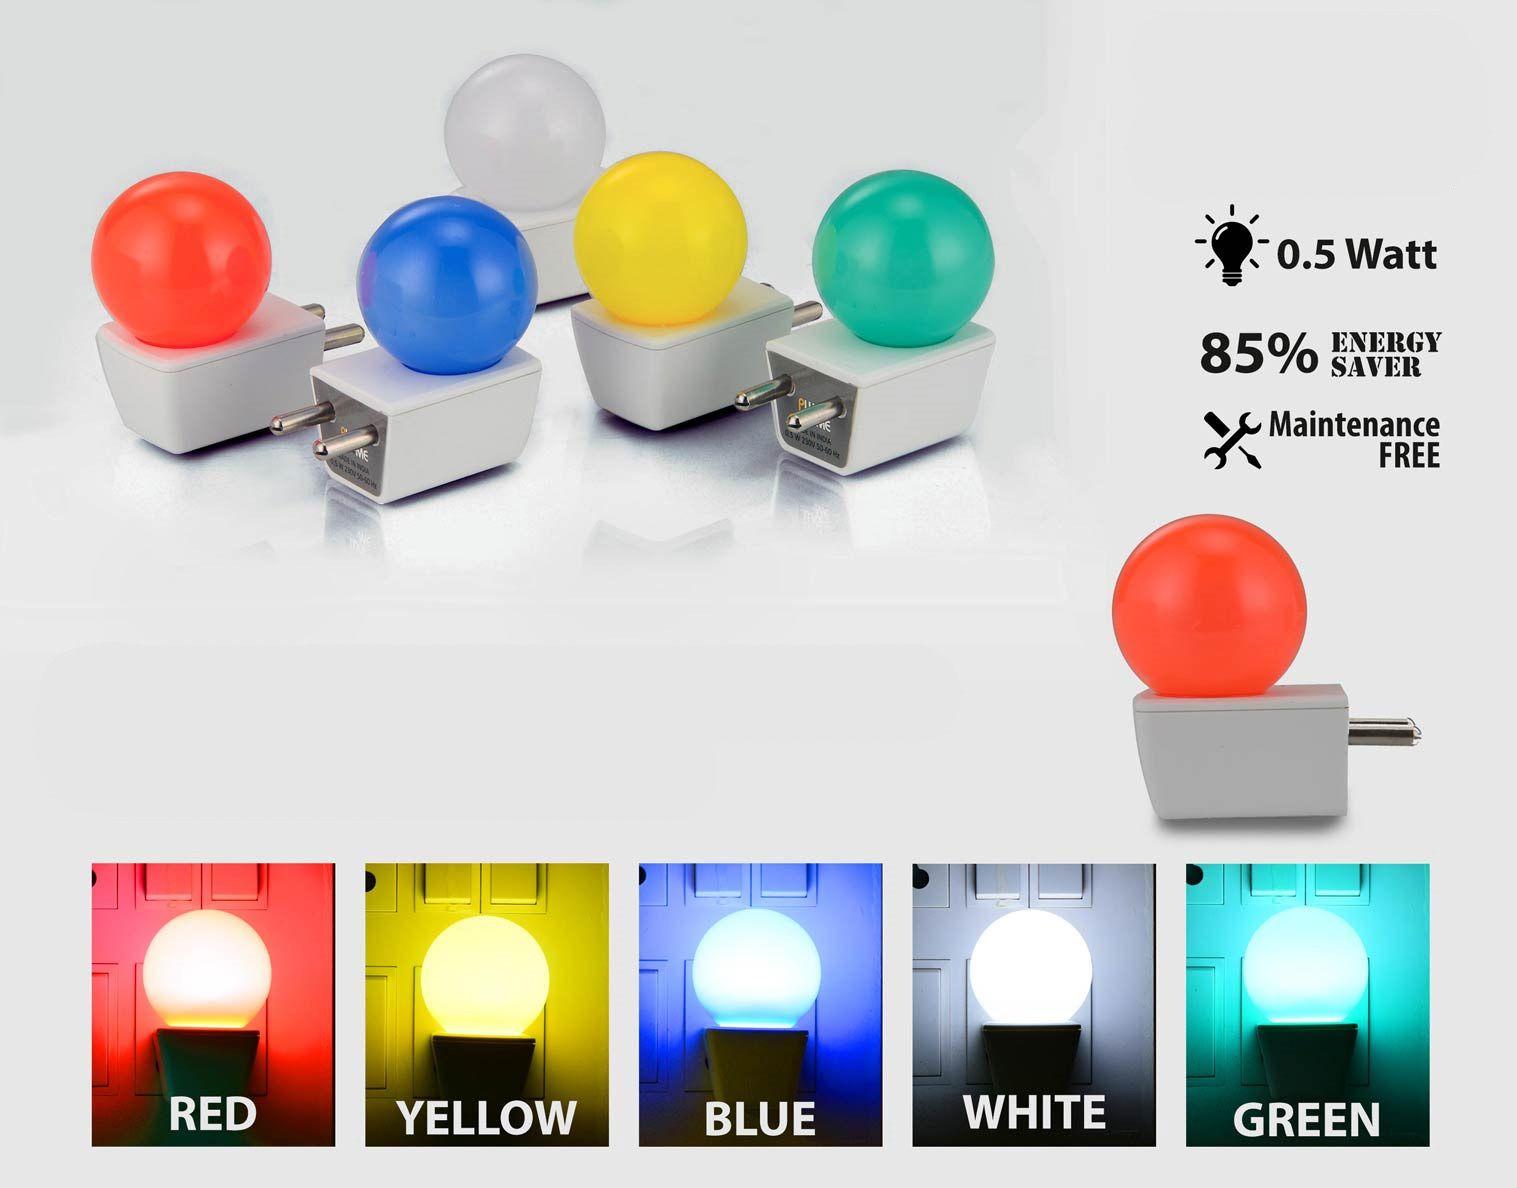 Power Plus Plug Me: Night Lamp With Half Watt Led (Unbreakable) E163